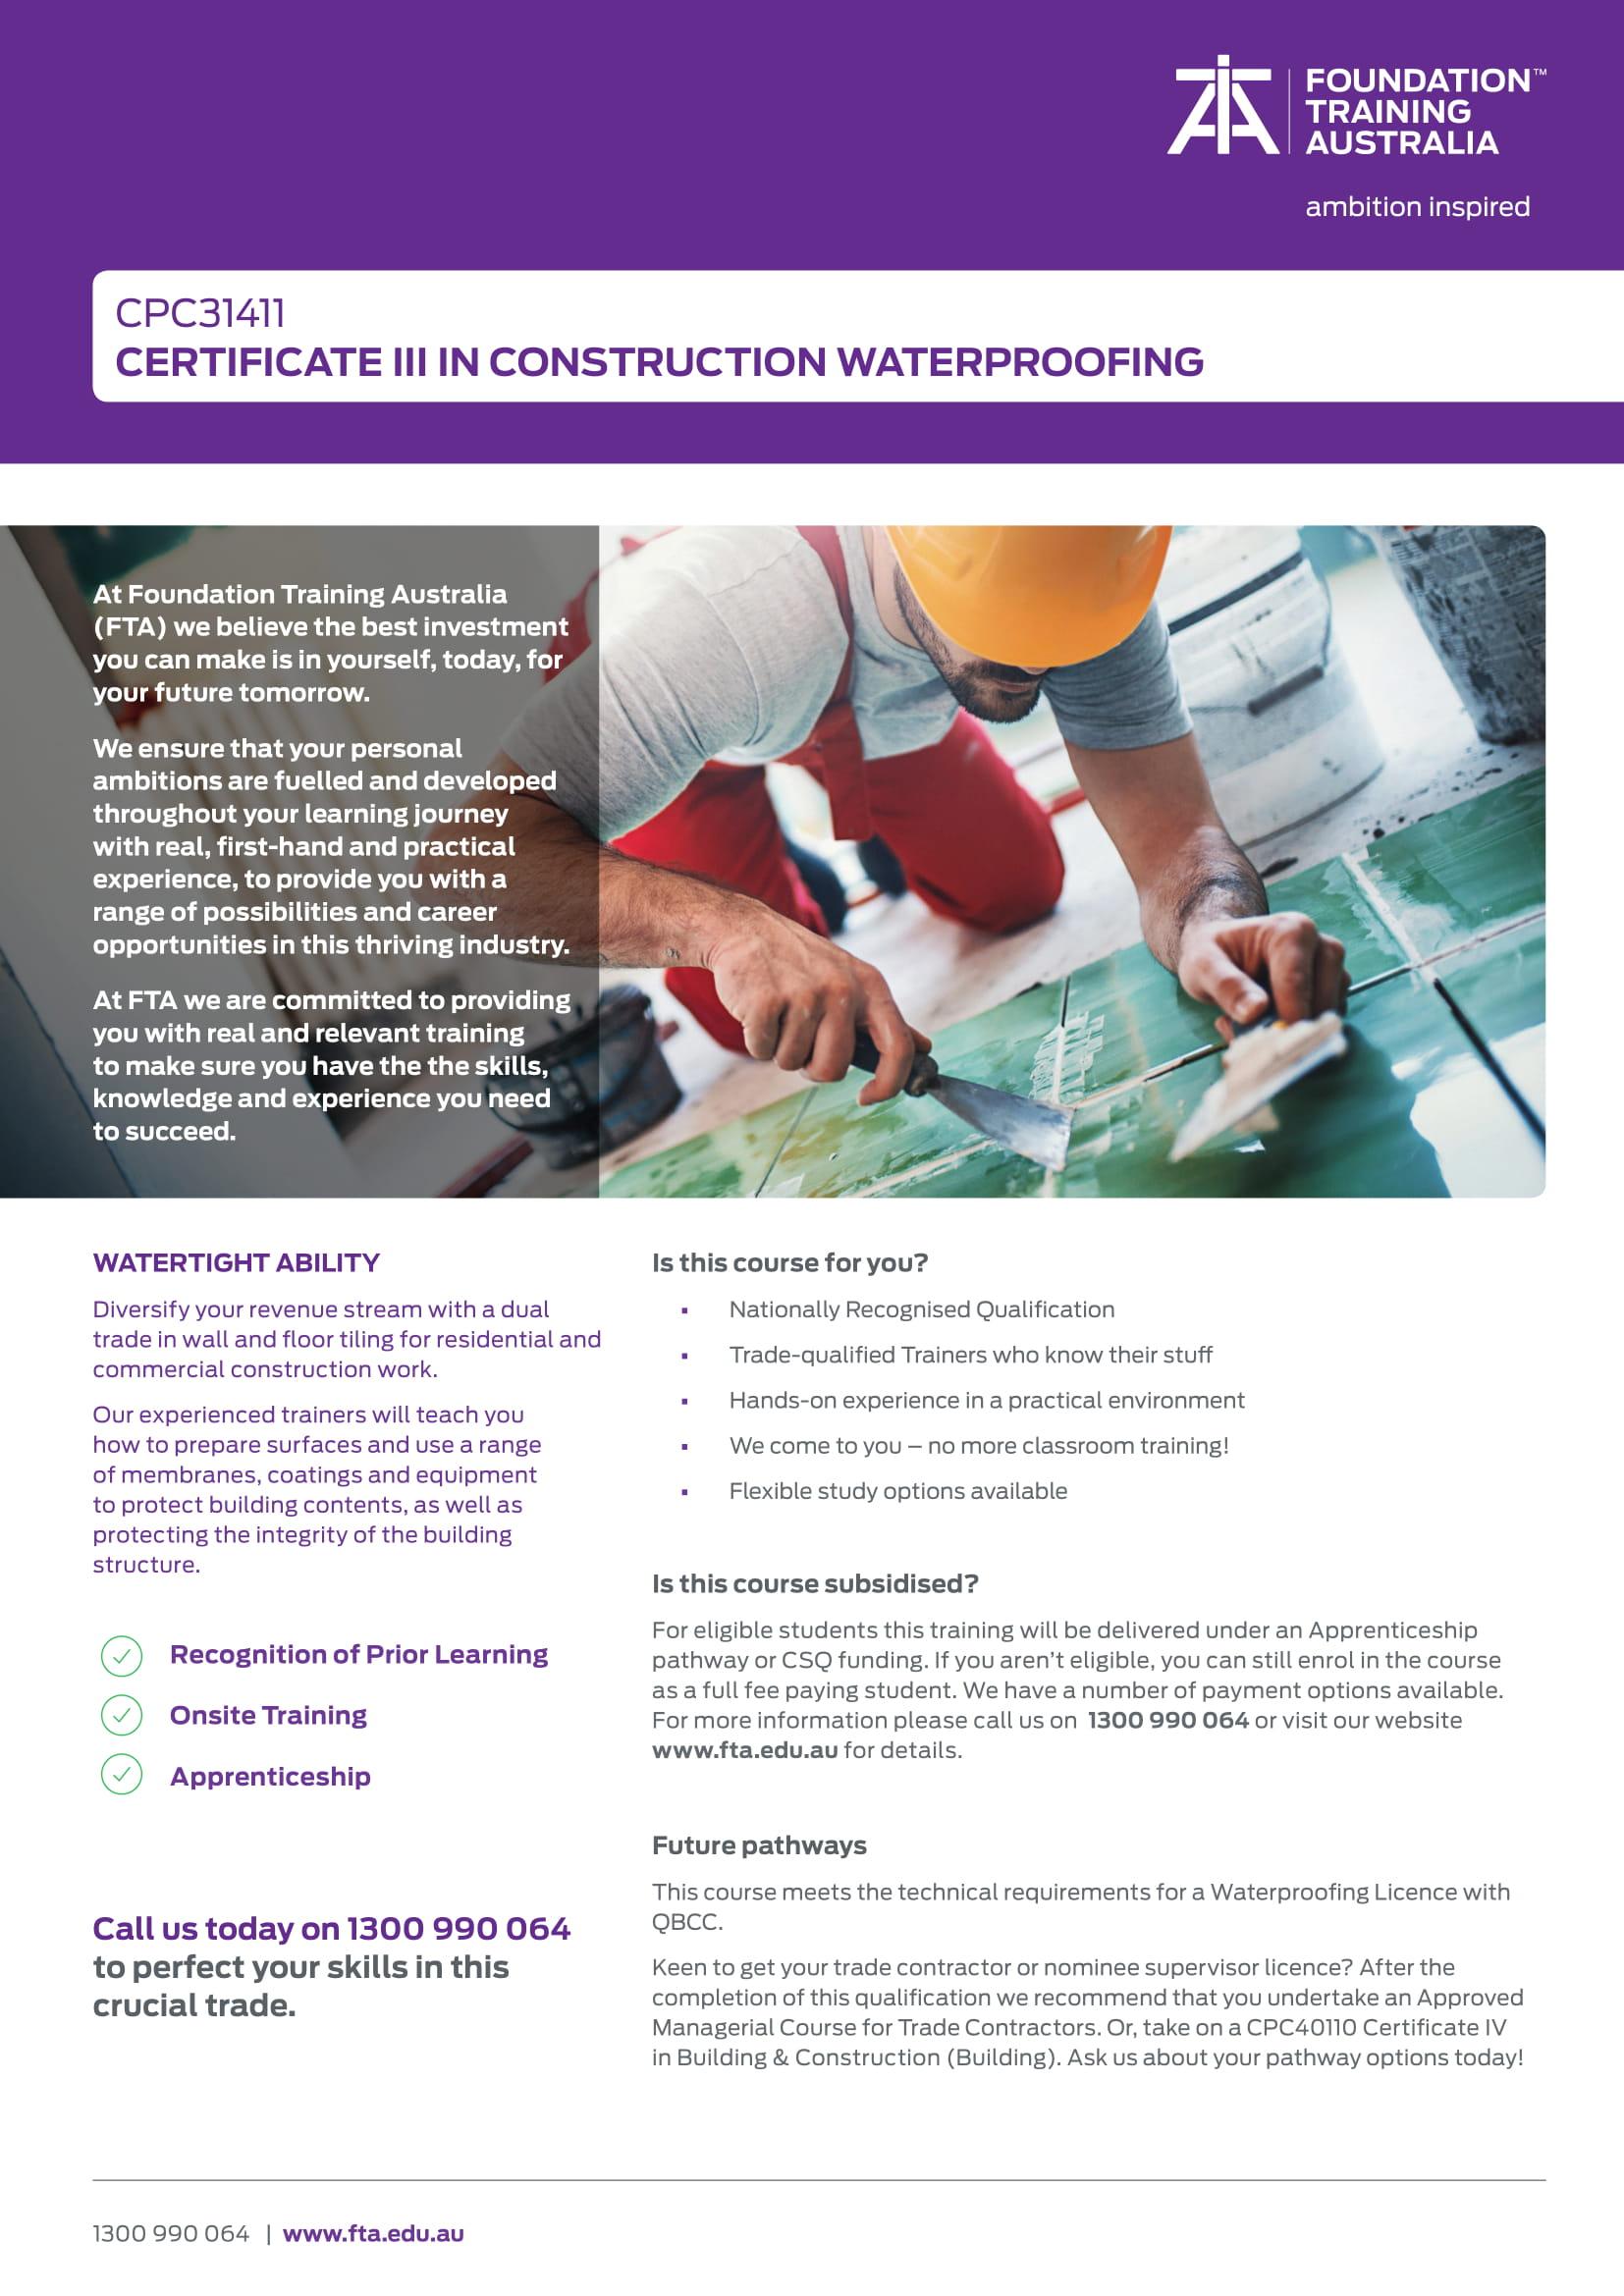 https://www.fta.edu.au/wp-content/uploads/2020/06/TP1.MK_.005-Construction-Waterproofing-Course-Flyer-V5-DIGITAL-1.jpg